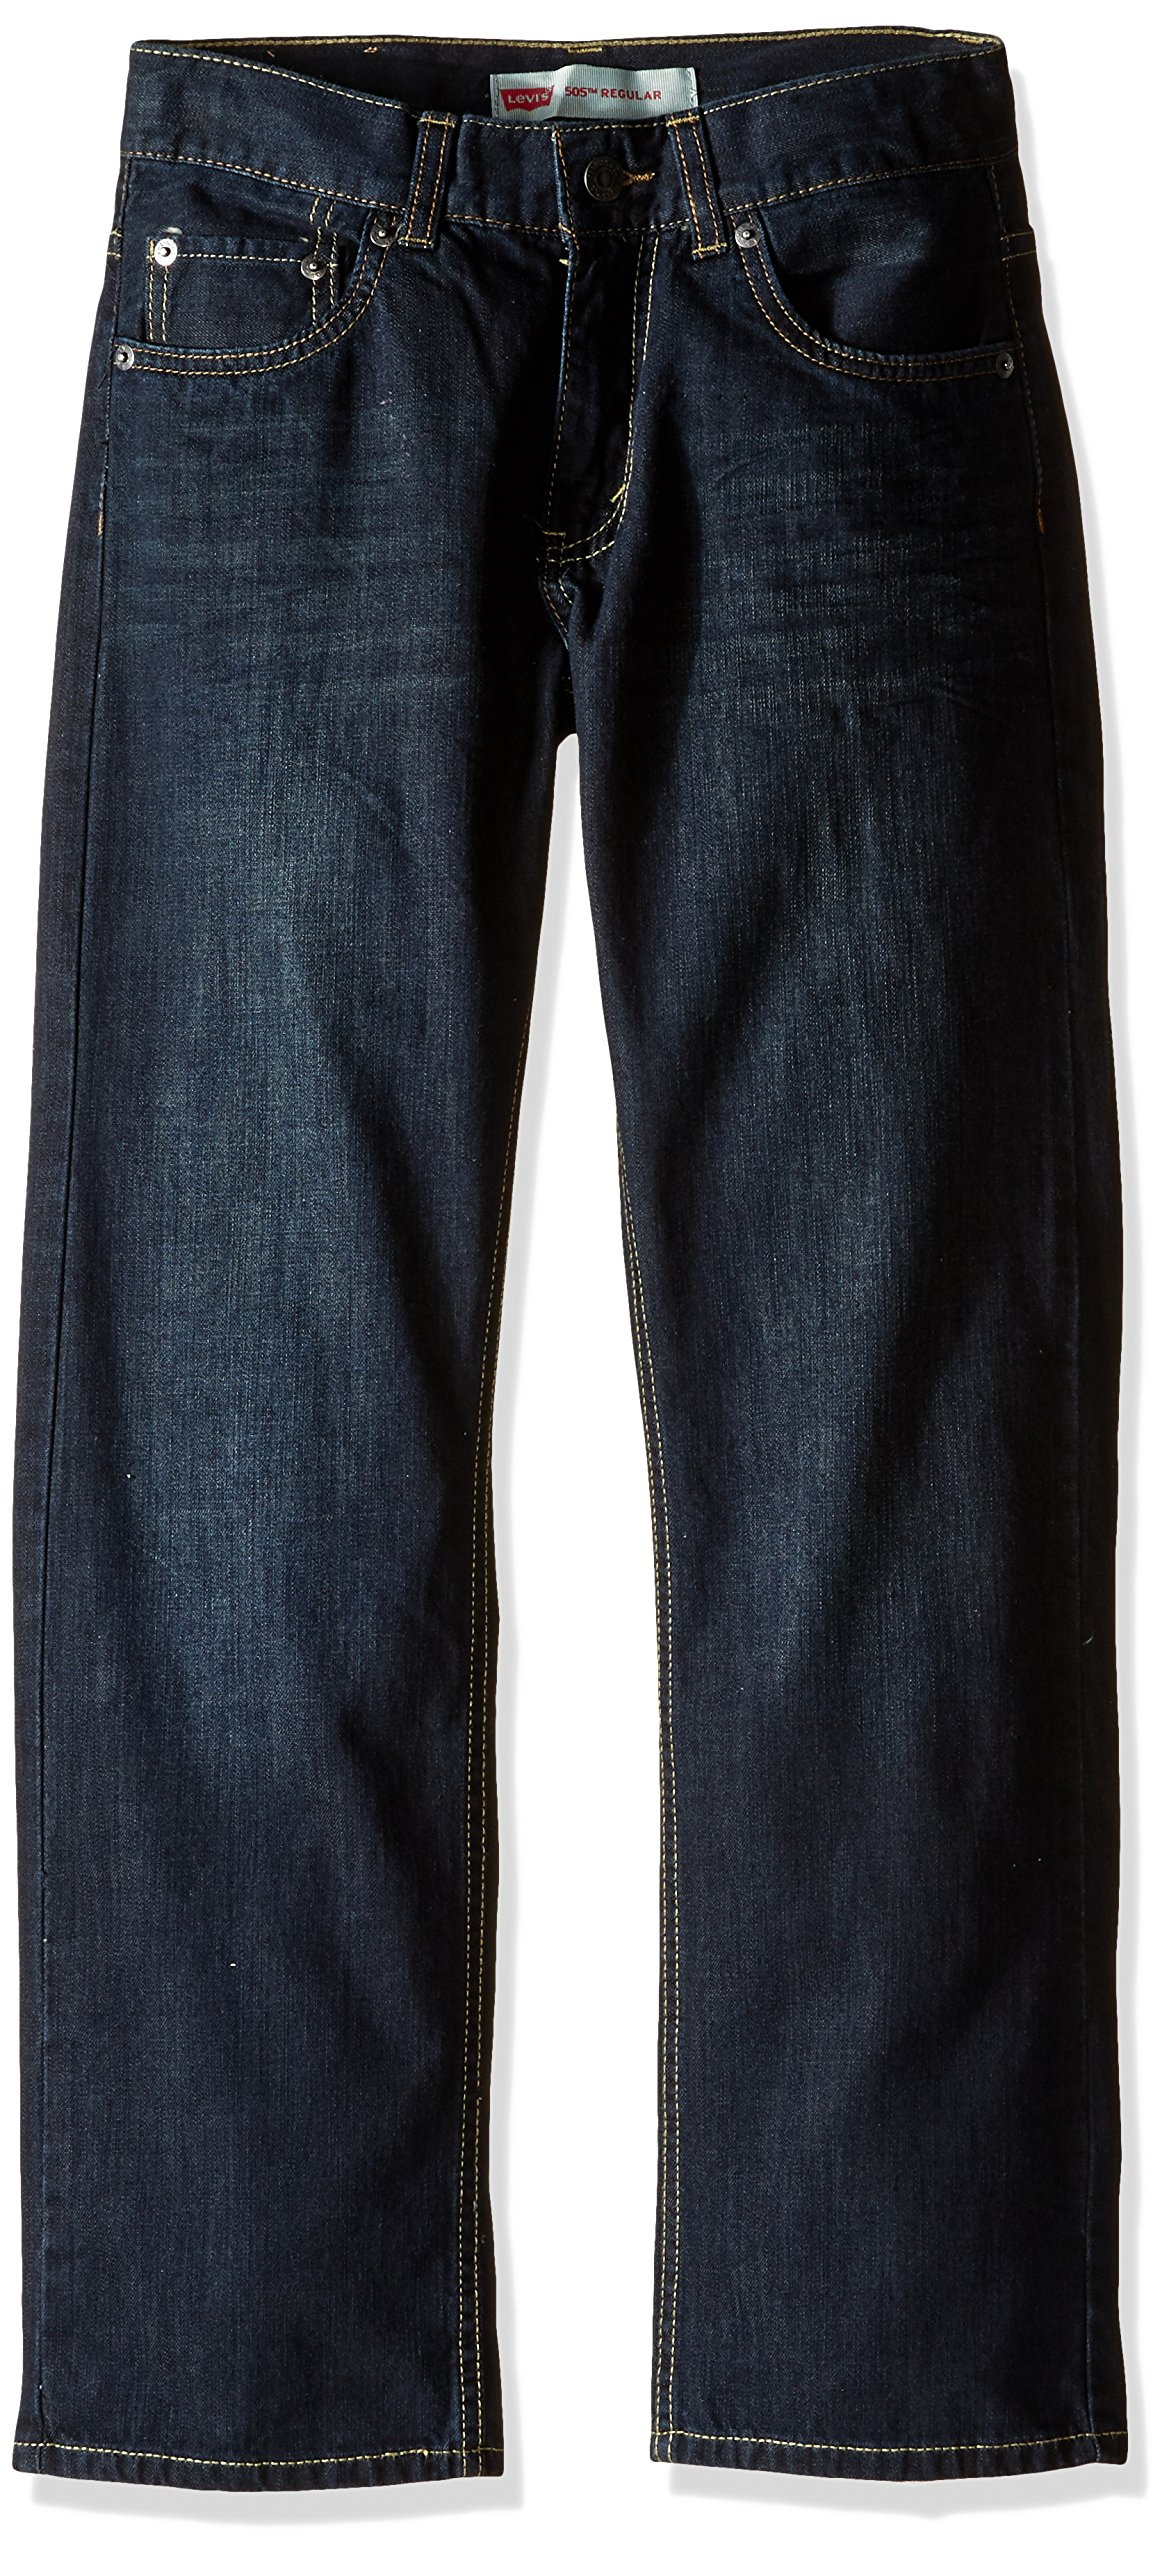 Levi's Boys' 505 Regular Fit Jeans, Dirt Road, 14